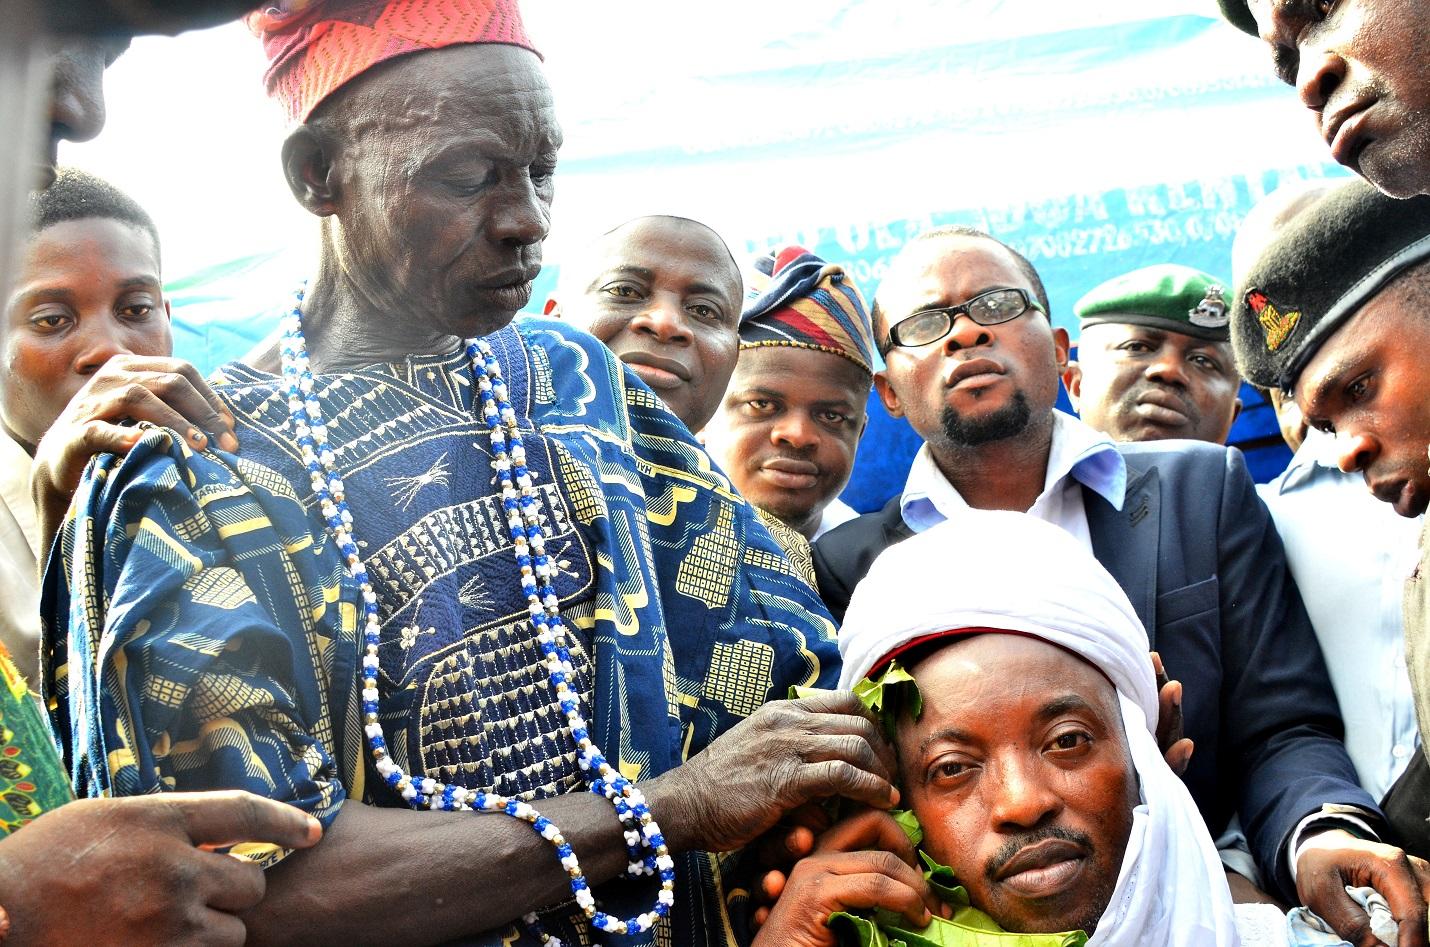 Newly installed Oluwo of Iwo, Oba Rasheed Adewale Akanbi being installed by Sobaloju of Iwoland, Chief  Safiriyu Aremu, during the Turbaning/Installation of the new Oluwo of Iwo, at Oluwo Palace, Iwo, State of Osun on Monday 9/11/2015.